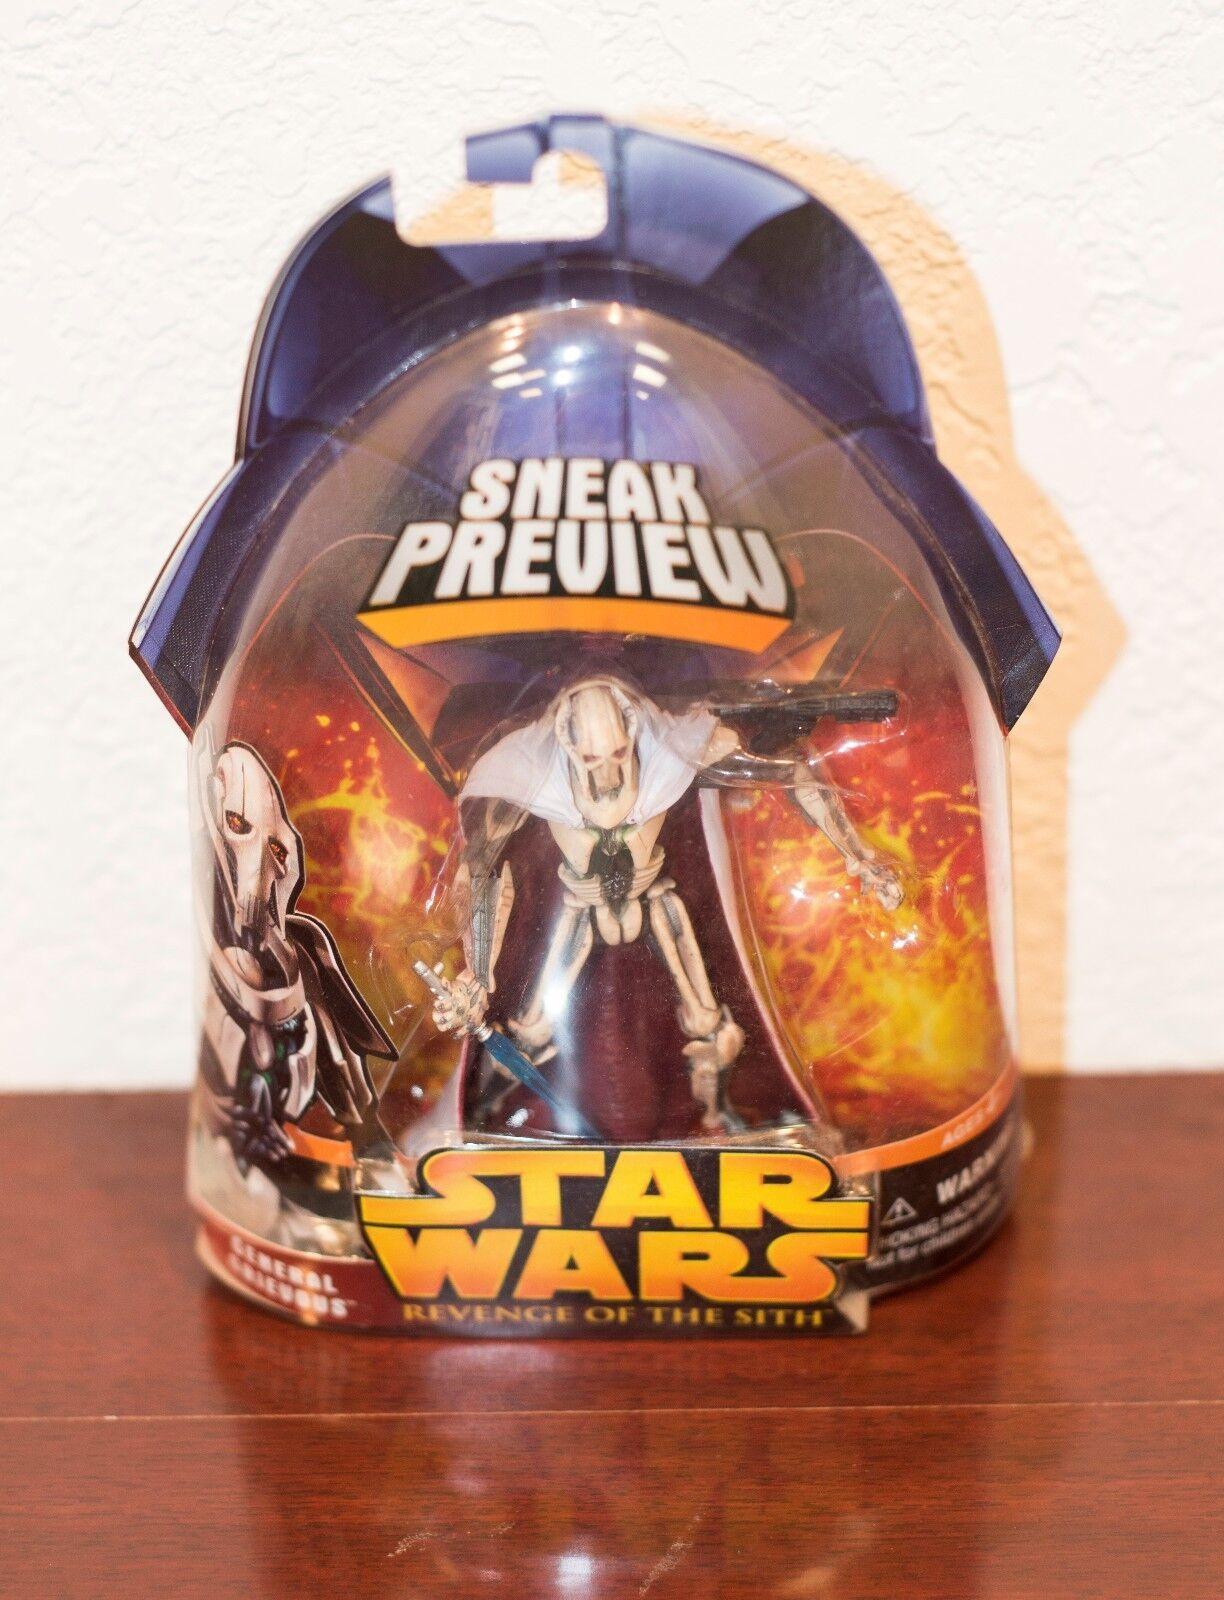 2005 STAR WARS SNEAK PREVIEW REVENGE OF THE SITH GENERAL GRIEVOUS FIGURE MOC